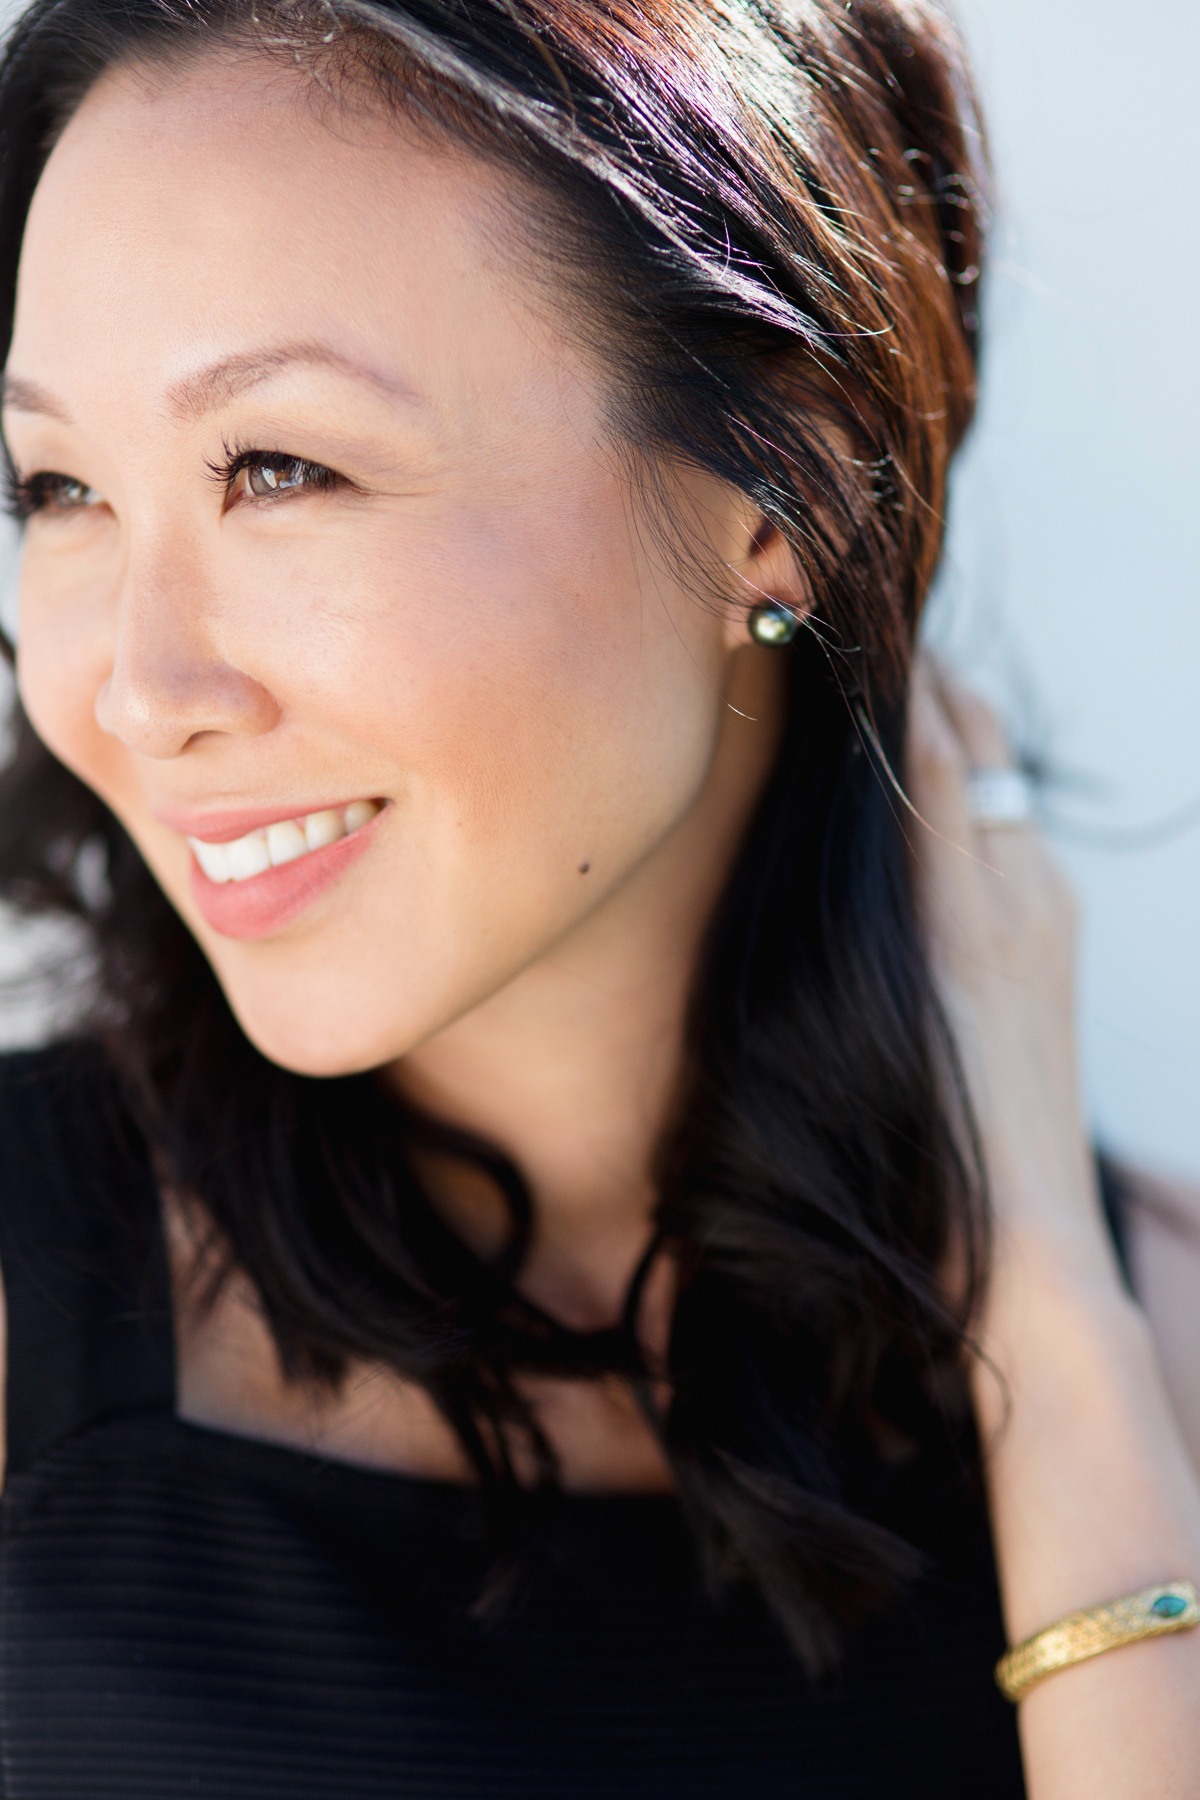 laguna-pearl-earrings-blogger-review-9918